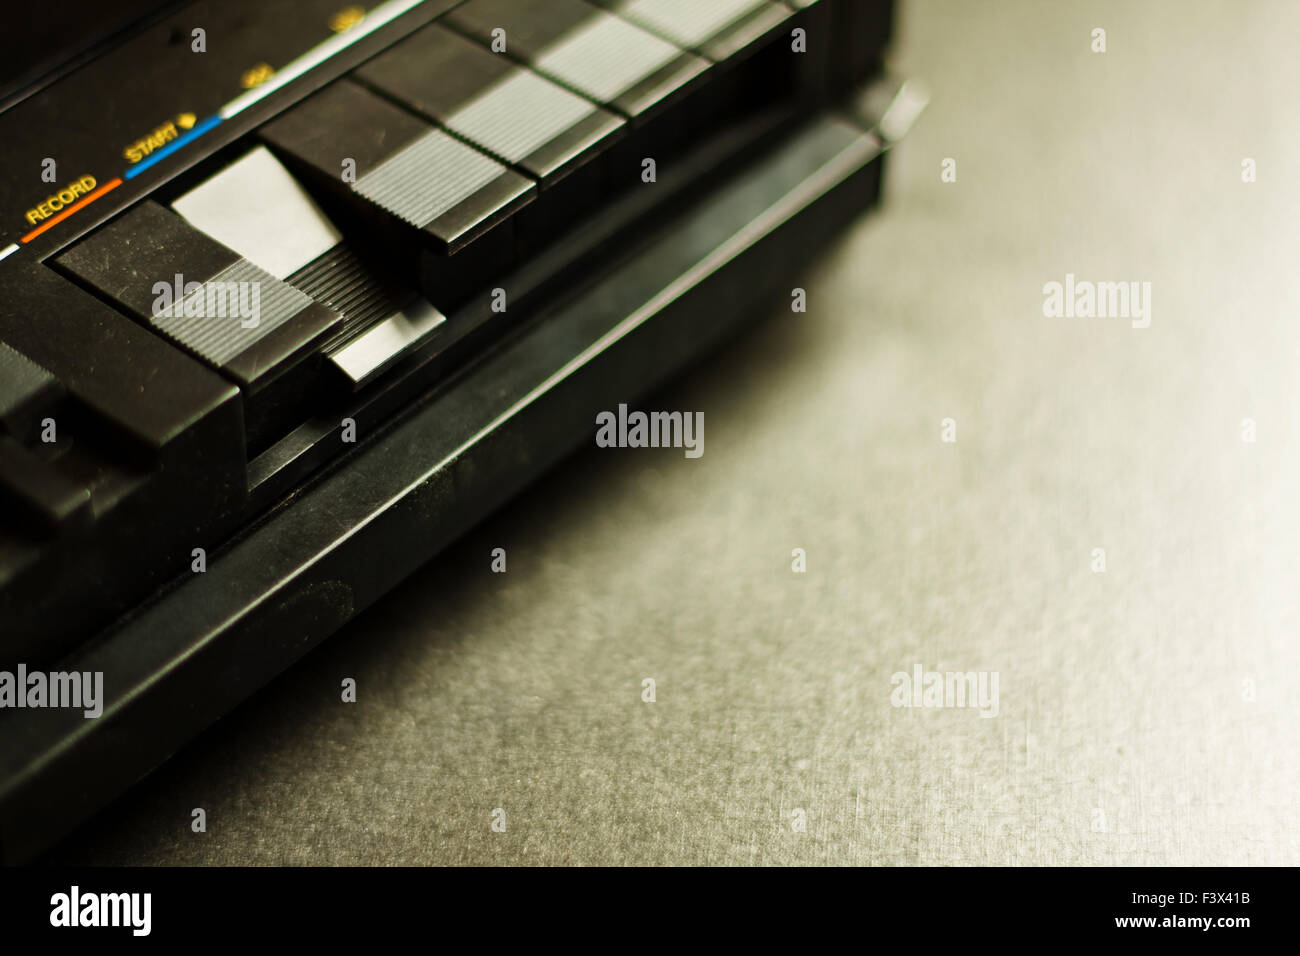 cassette tape recorder Stock Photo